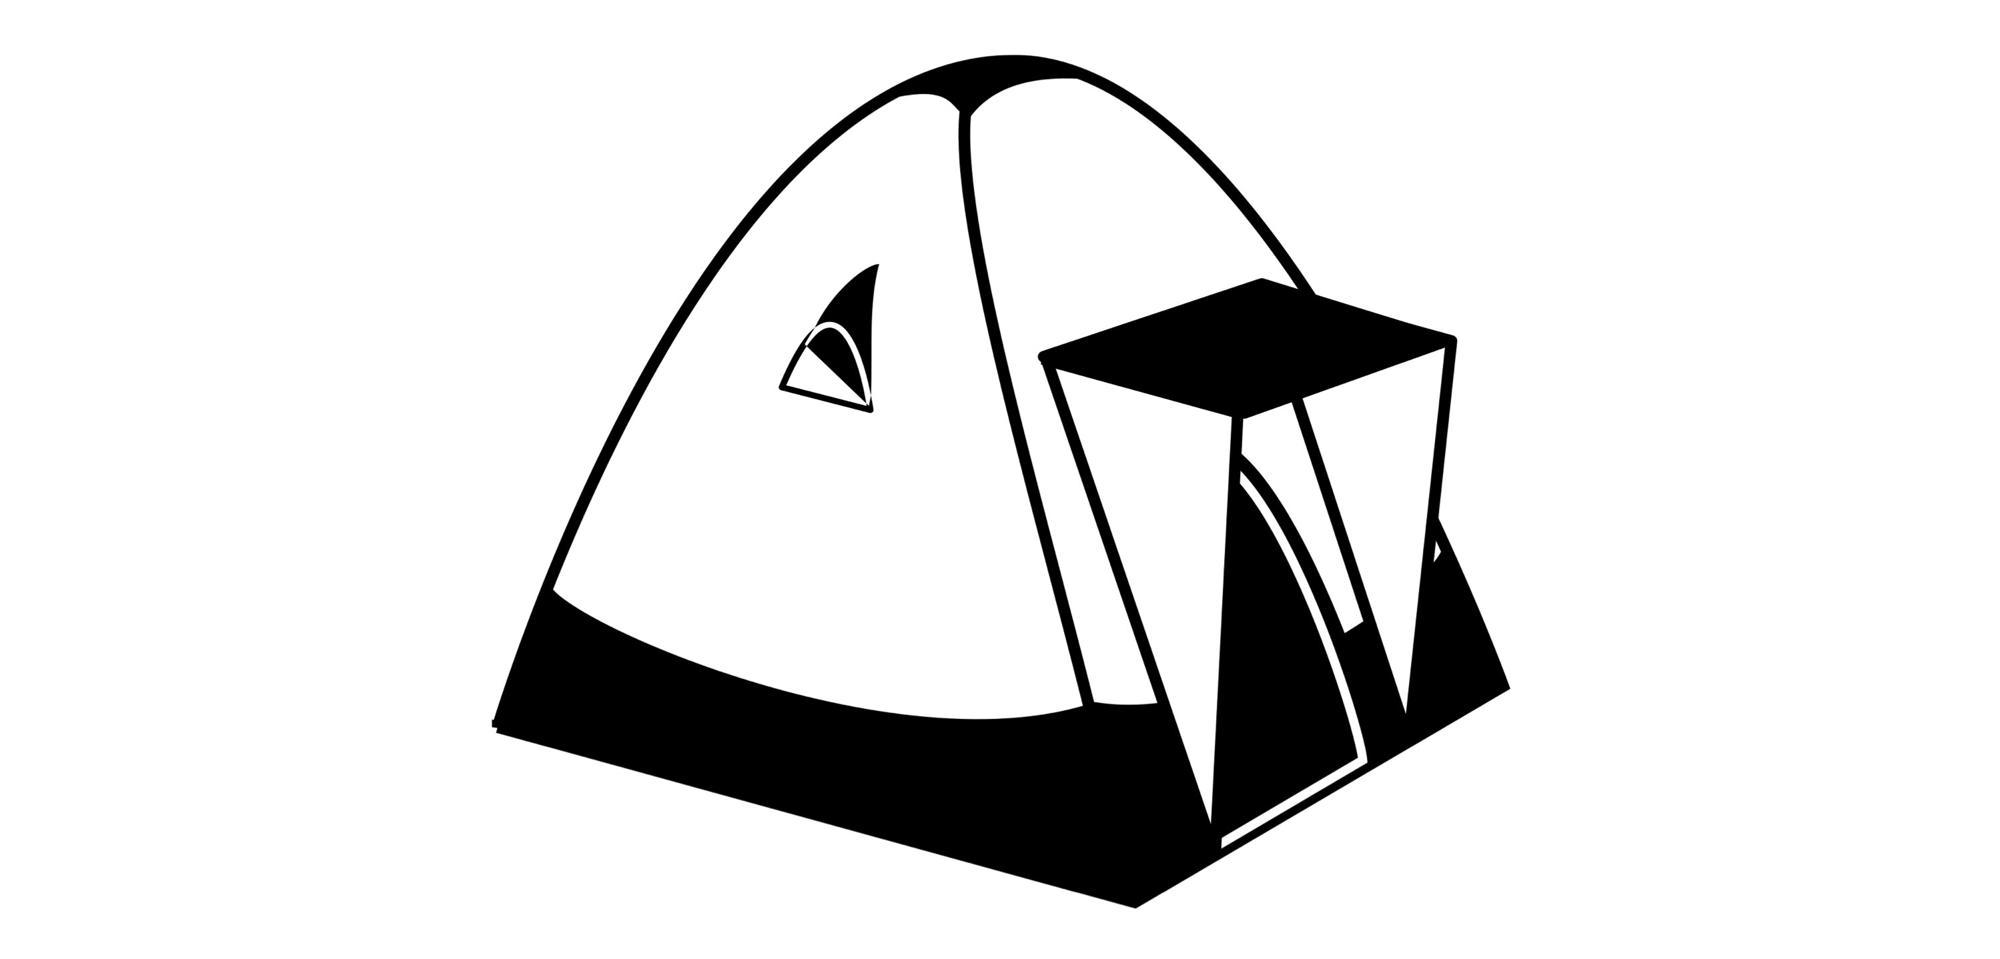 Dome tent illustration